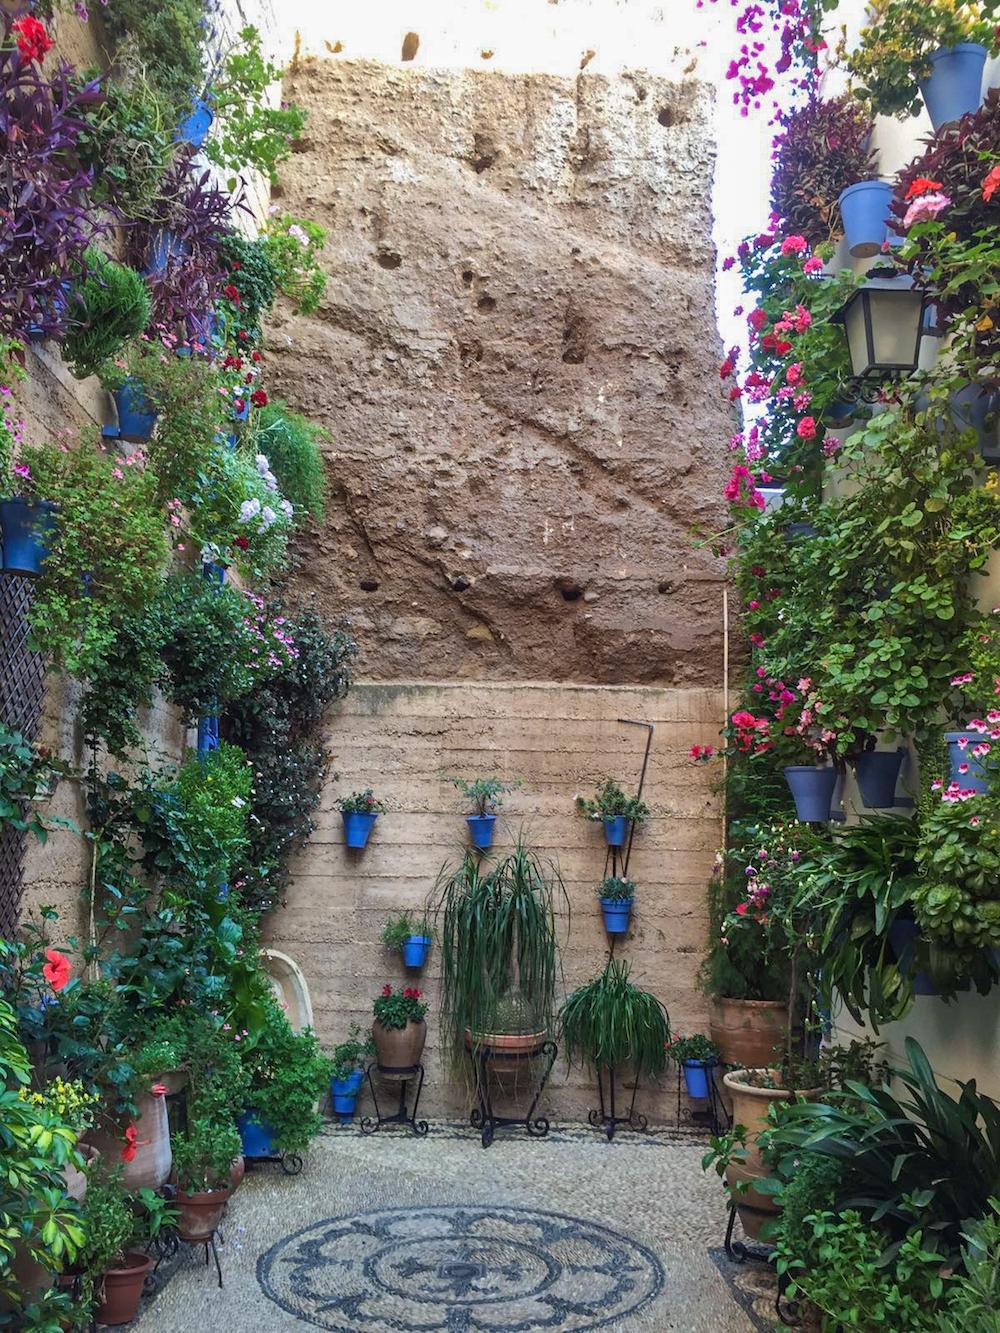 11 - festival in córdoba - romantische streken - straatje - bloemen